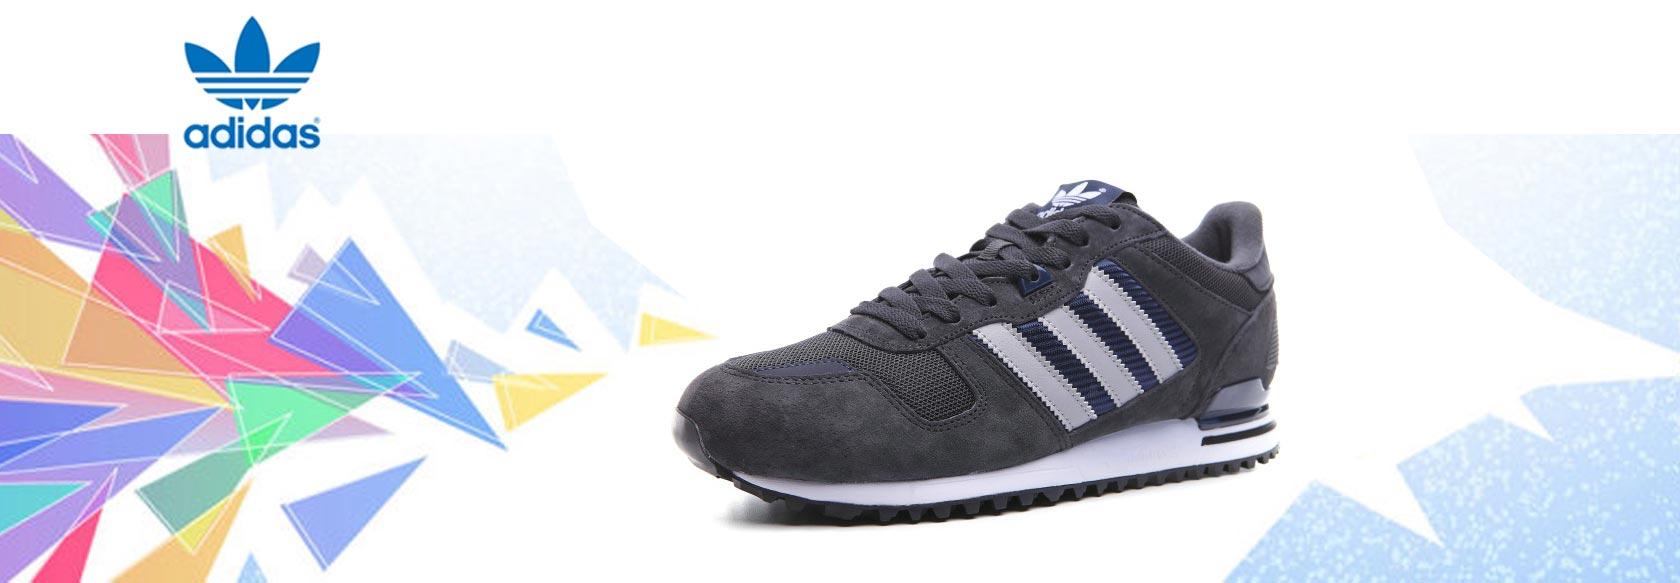 adidas鞋子 矢量图